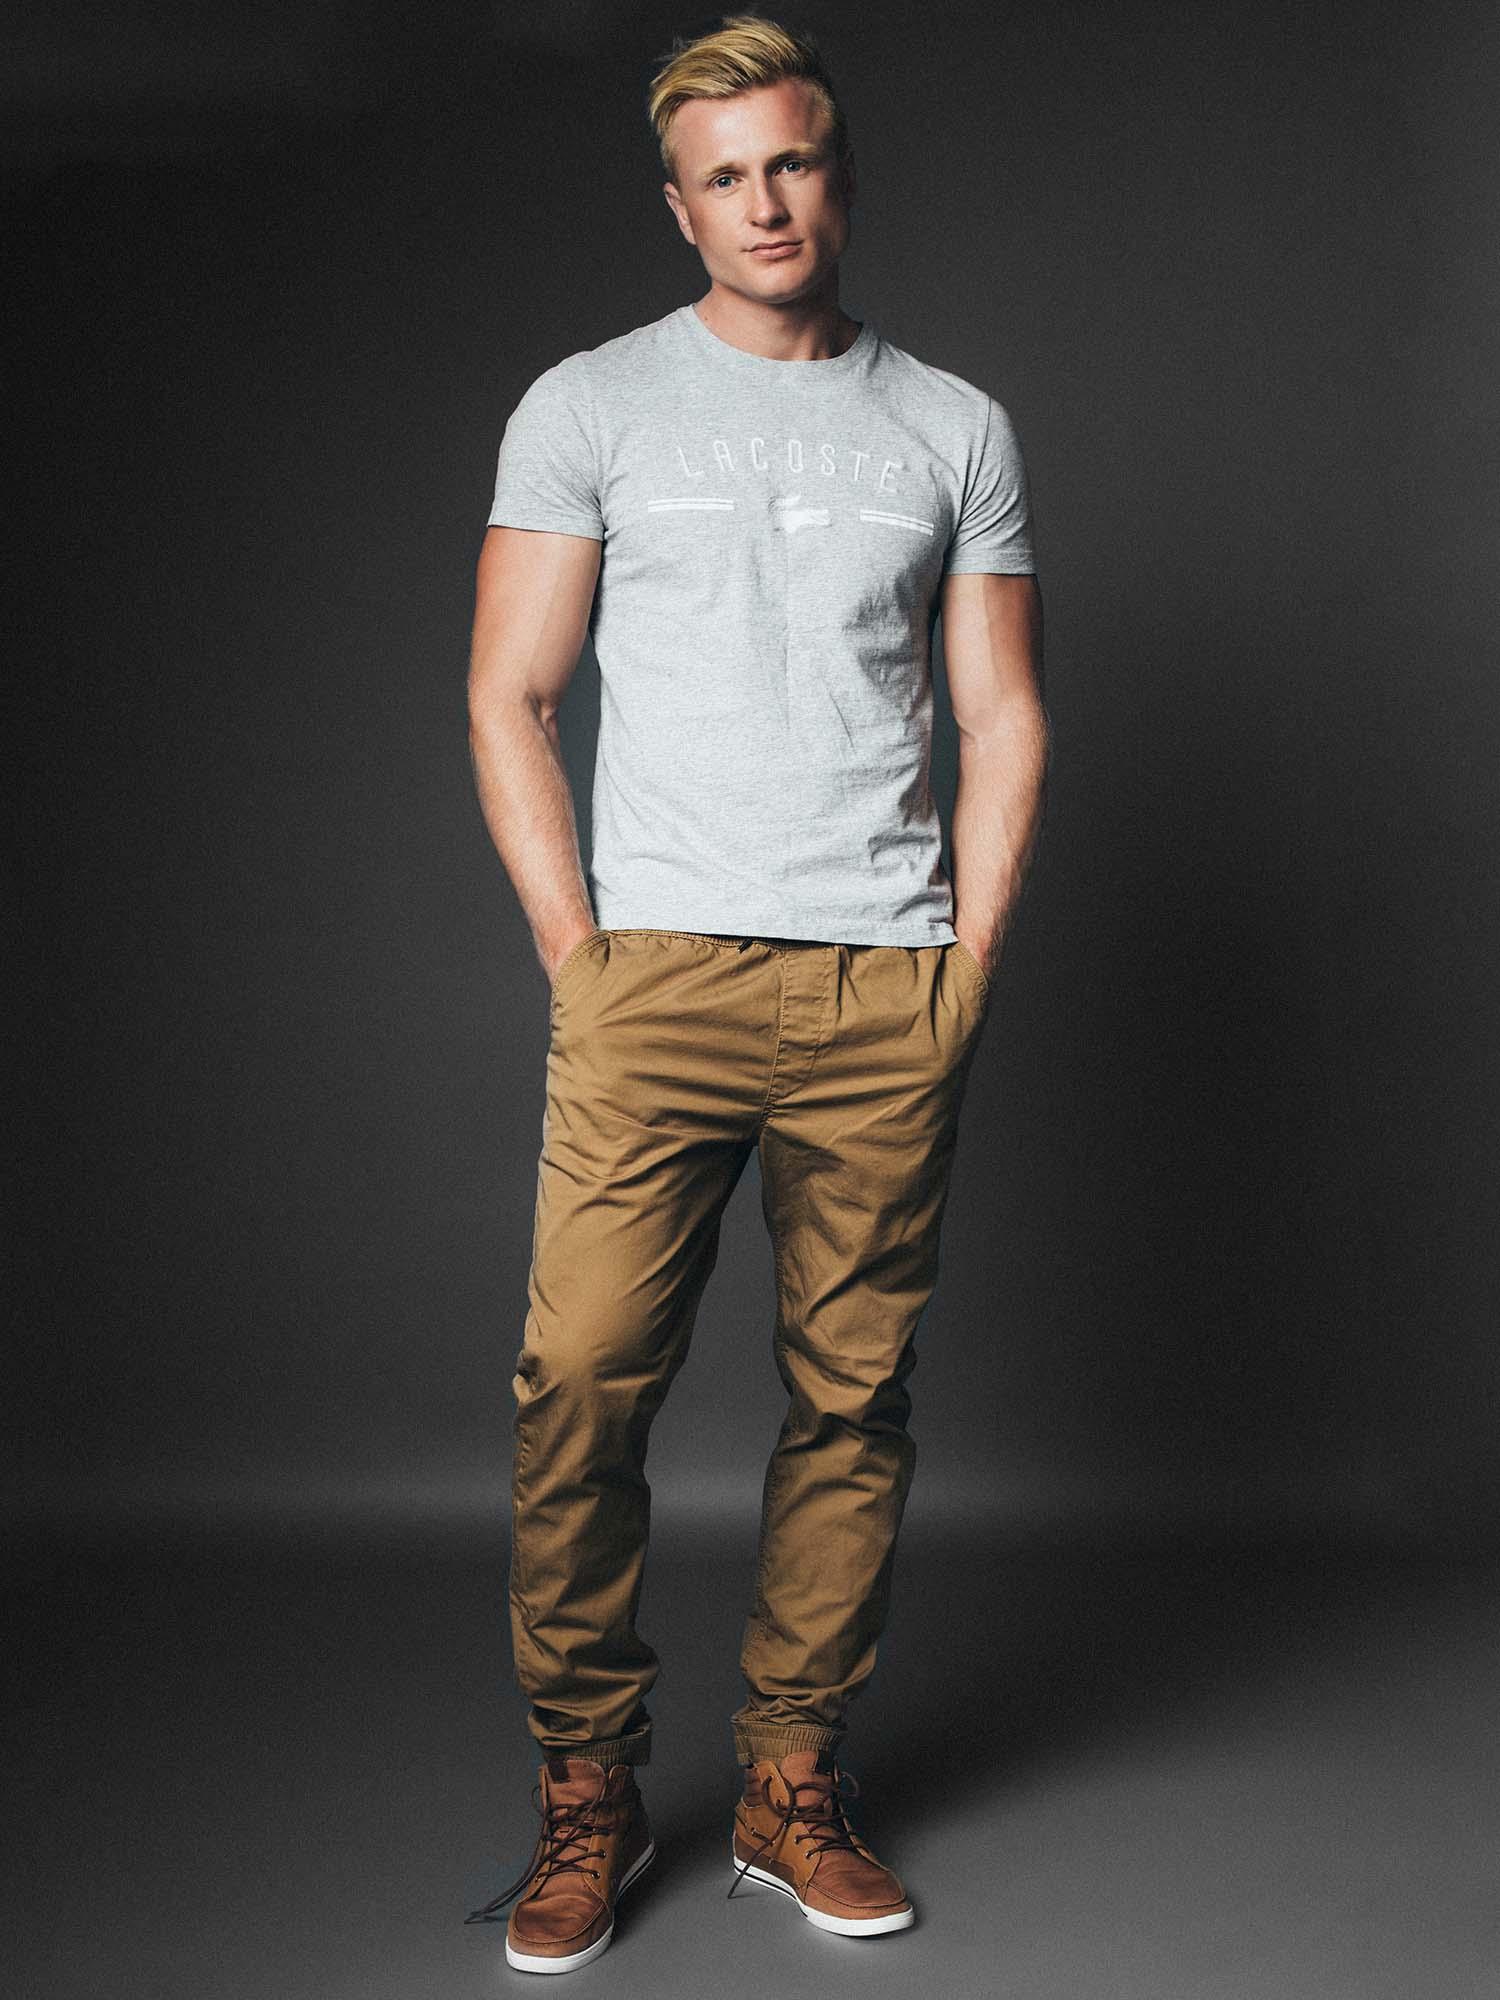 nyc-photographers-male-model-test-100094.jpg